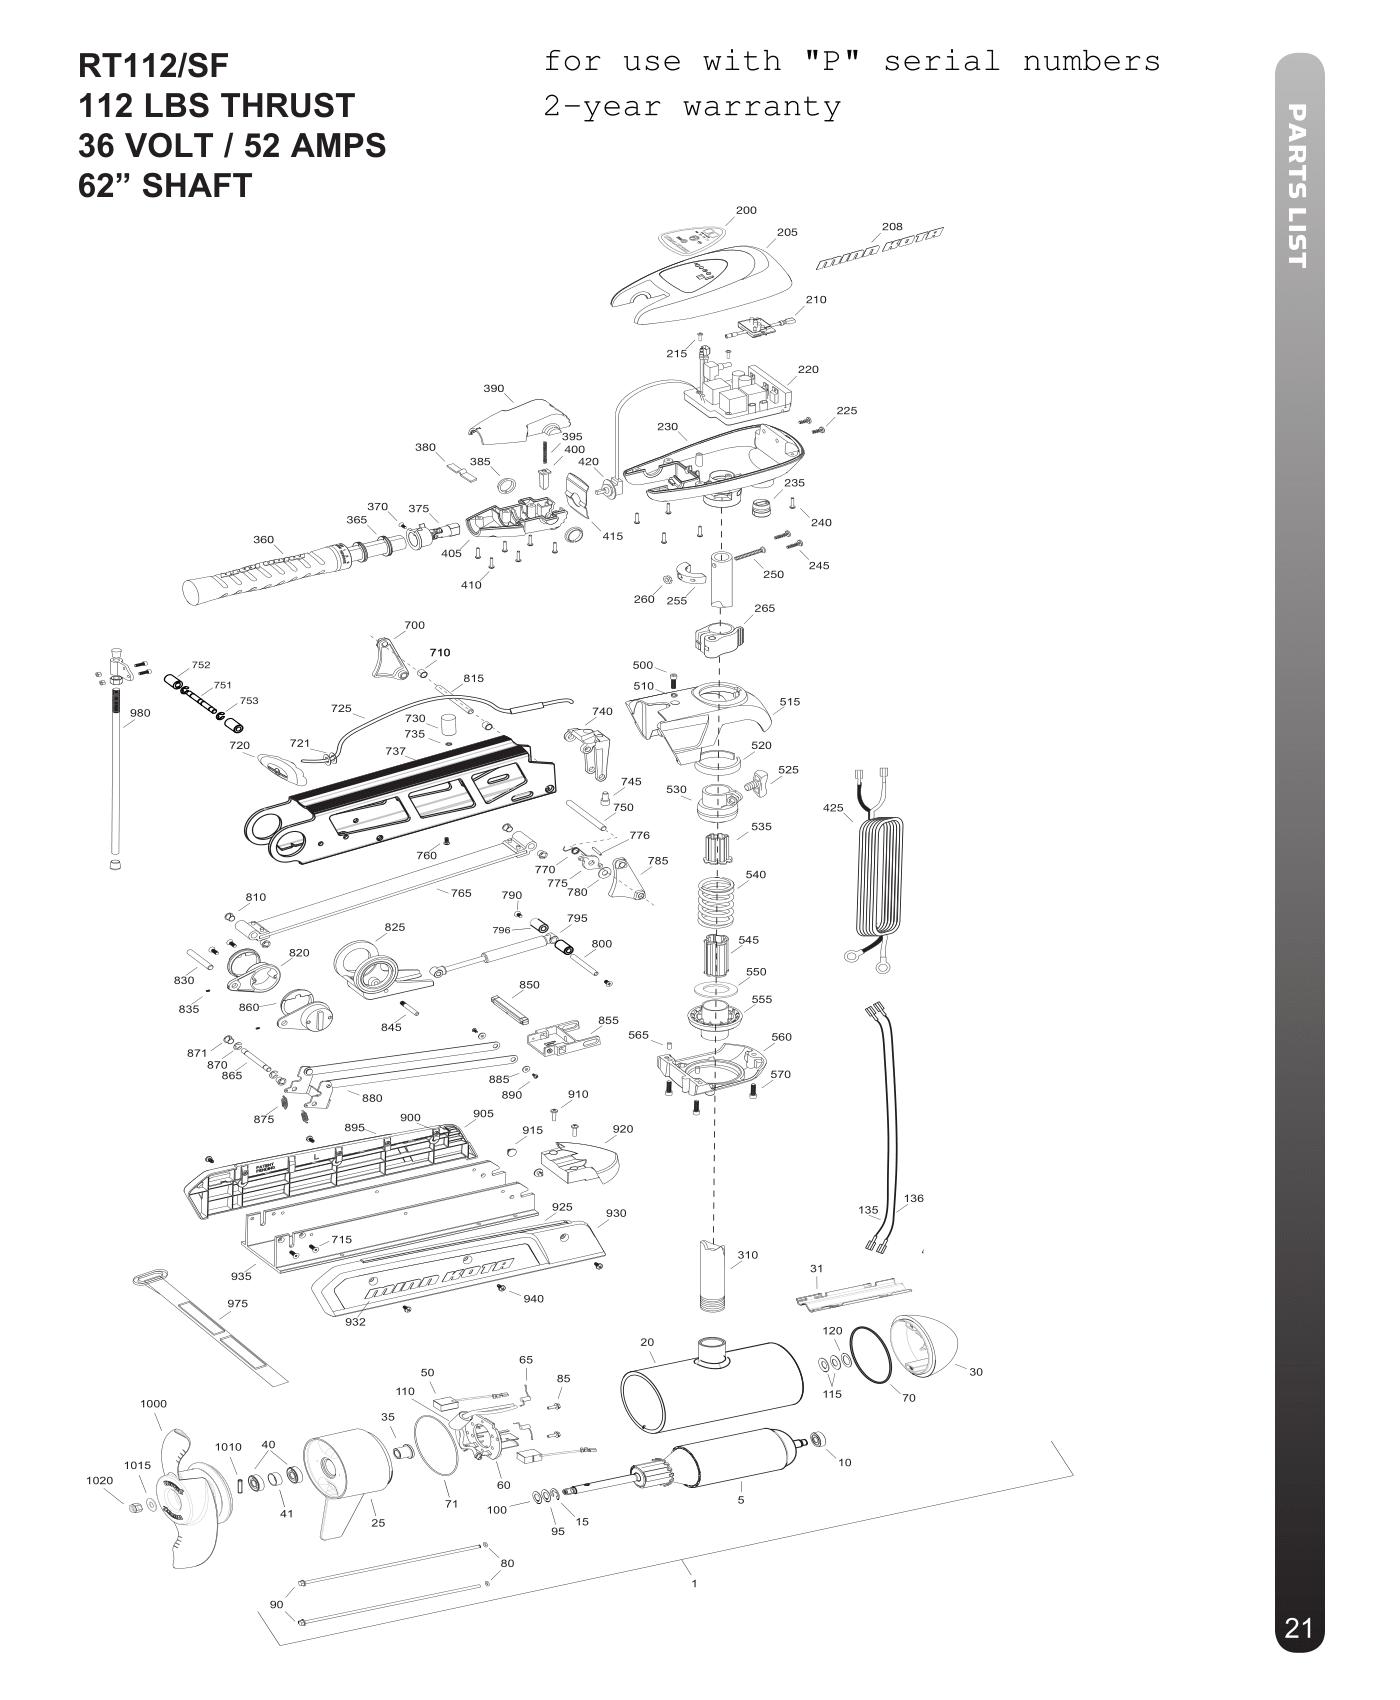 2015-mk-riptide112sf-1.png